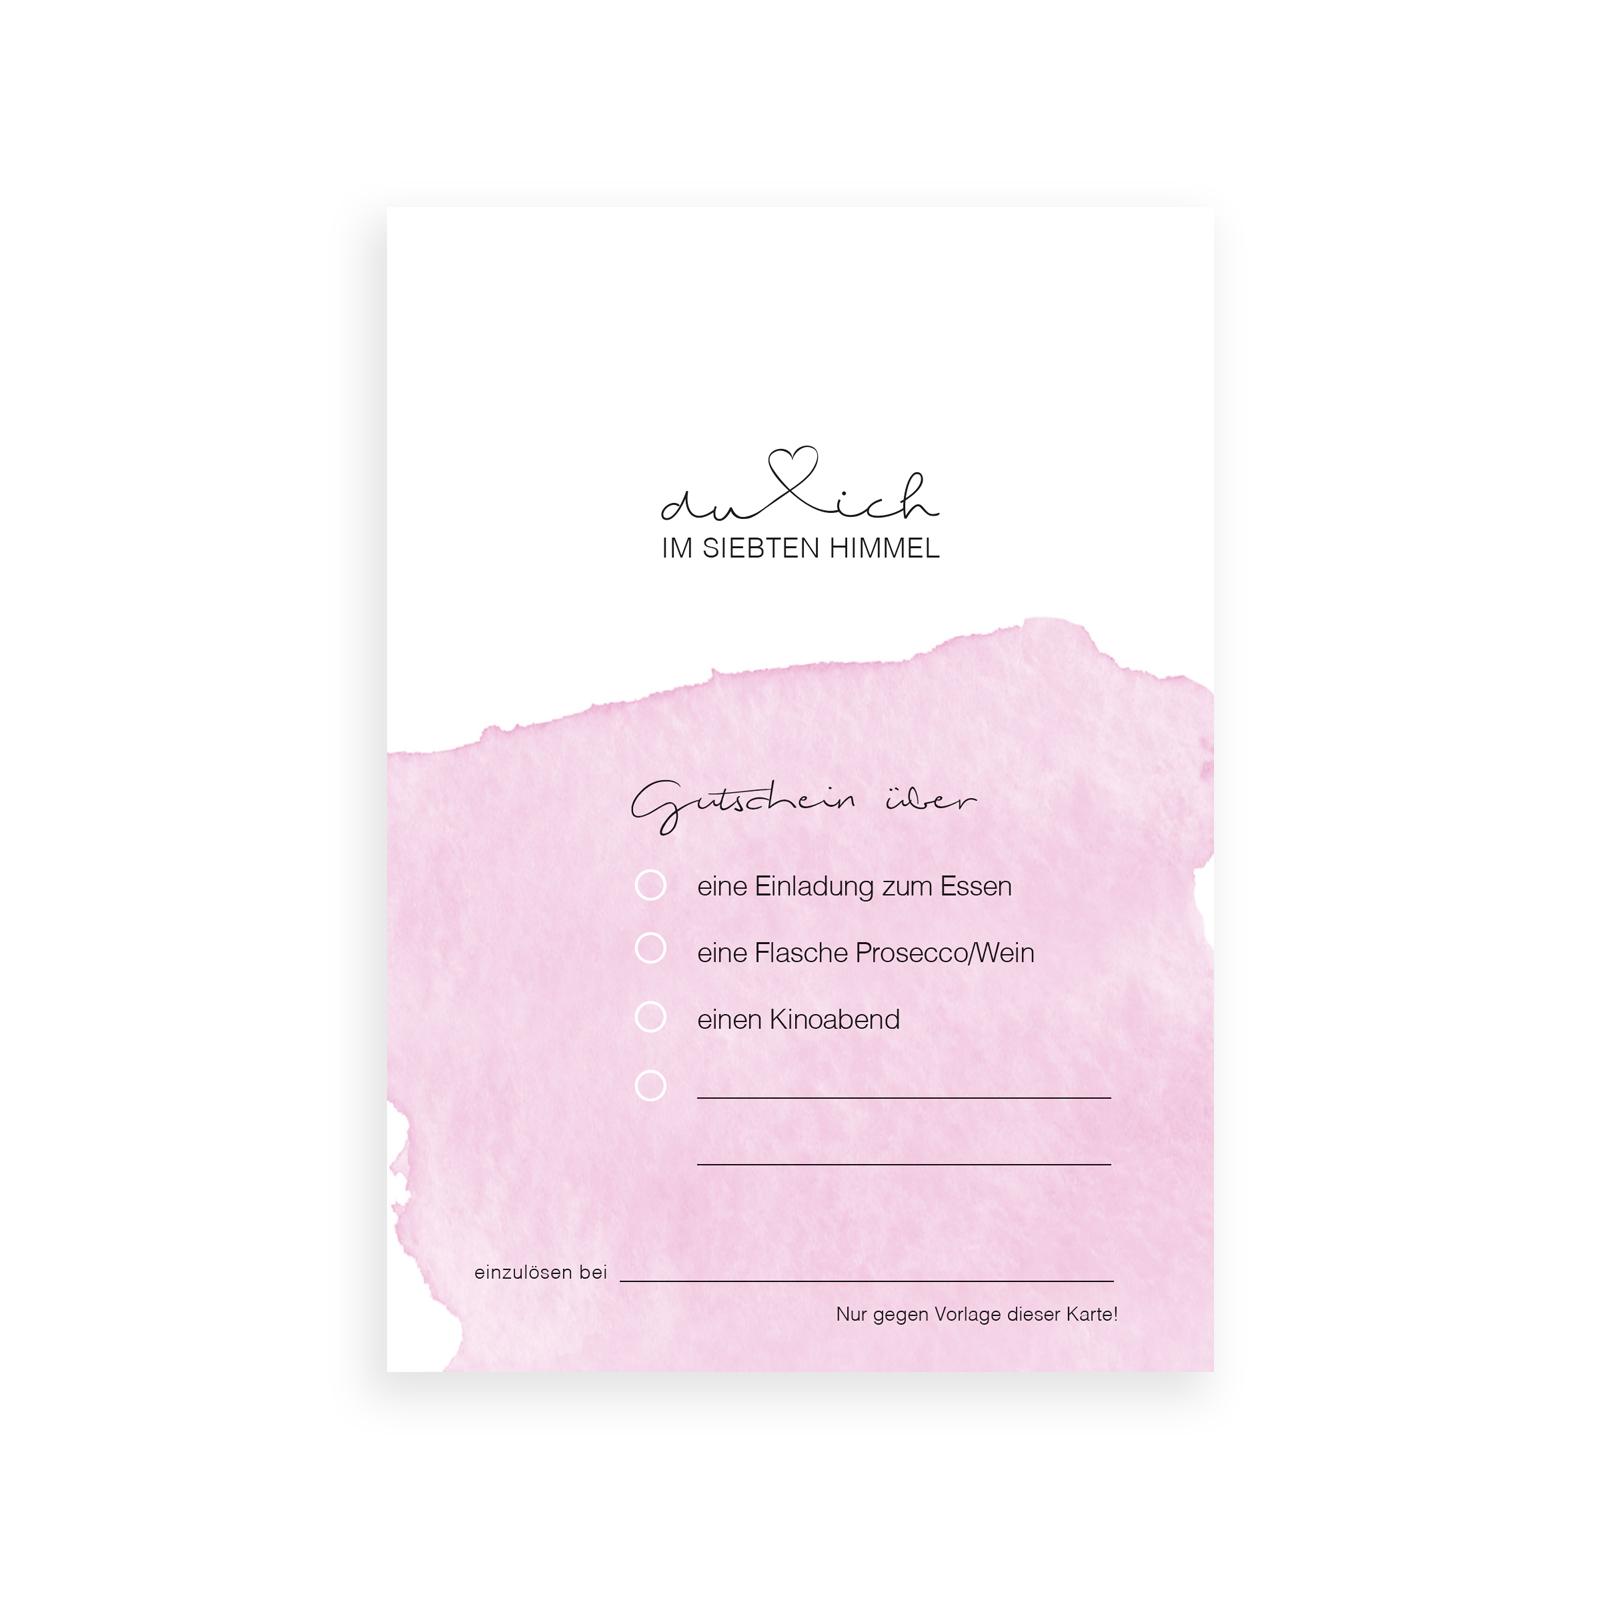 Hochzeit-Postkarte-Ballon-1 | Böck Design